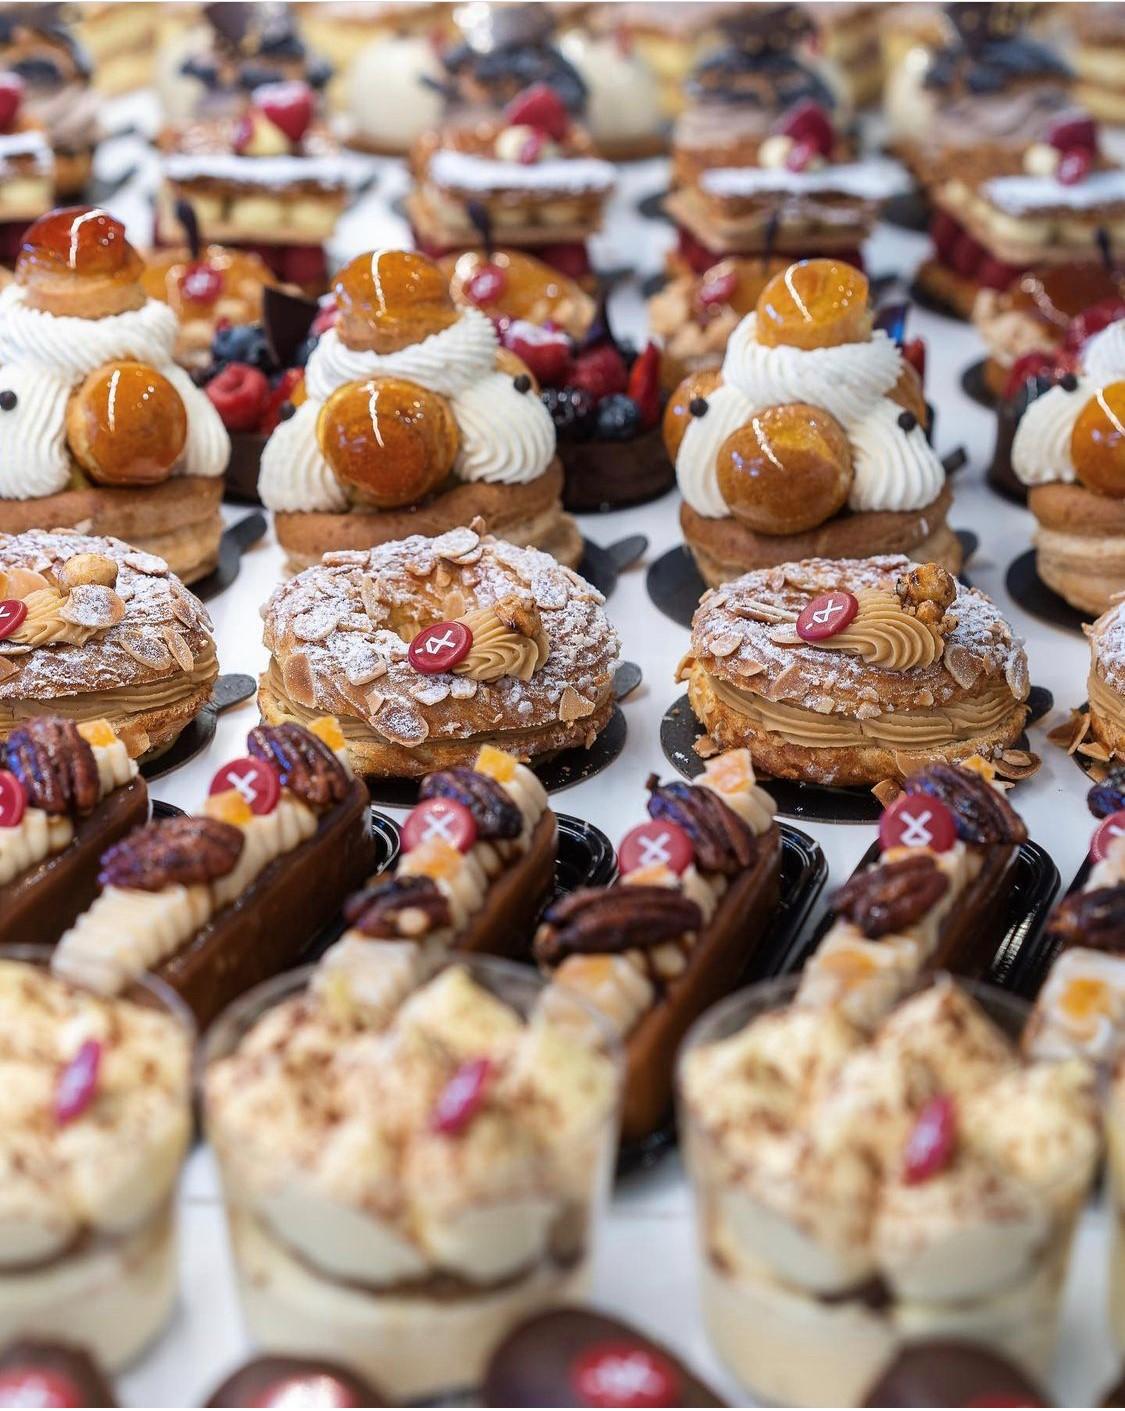 Enjoy a Taste of Paris with Moulin